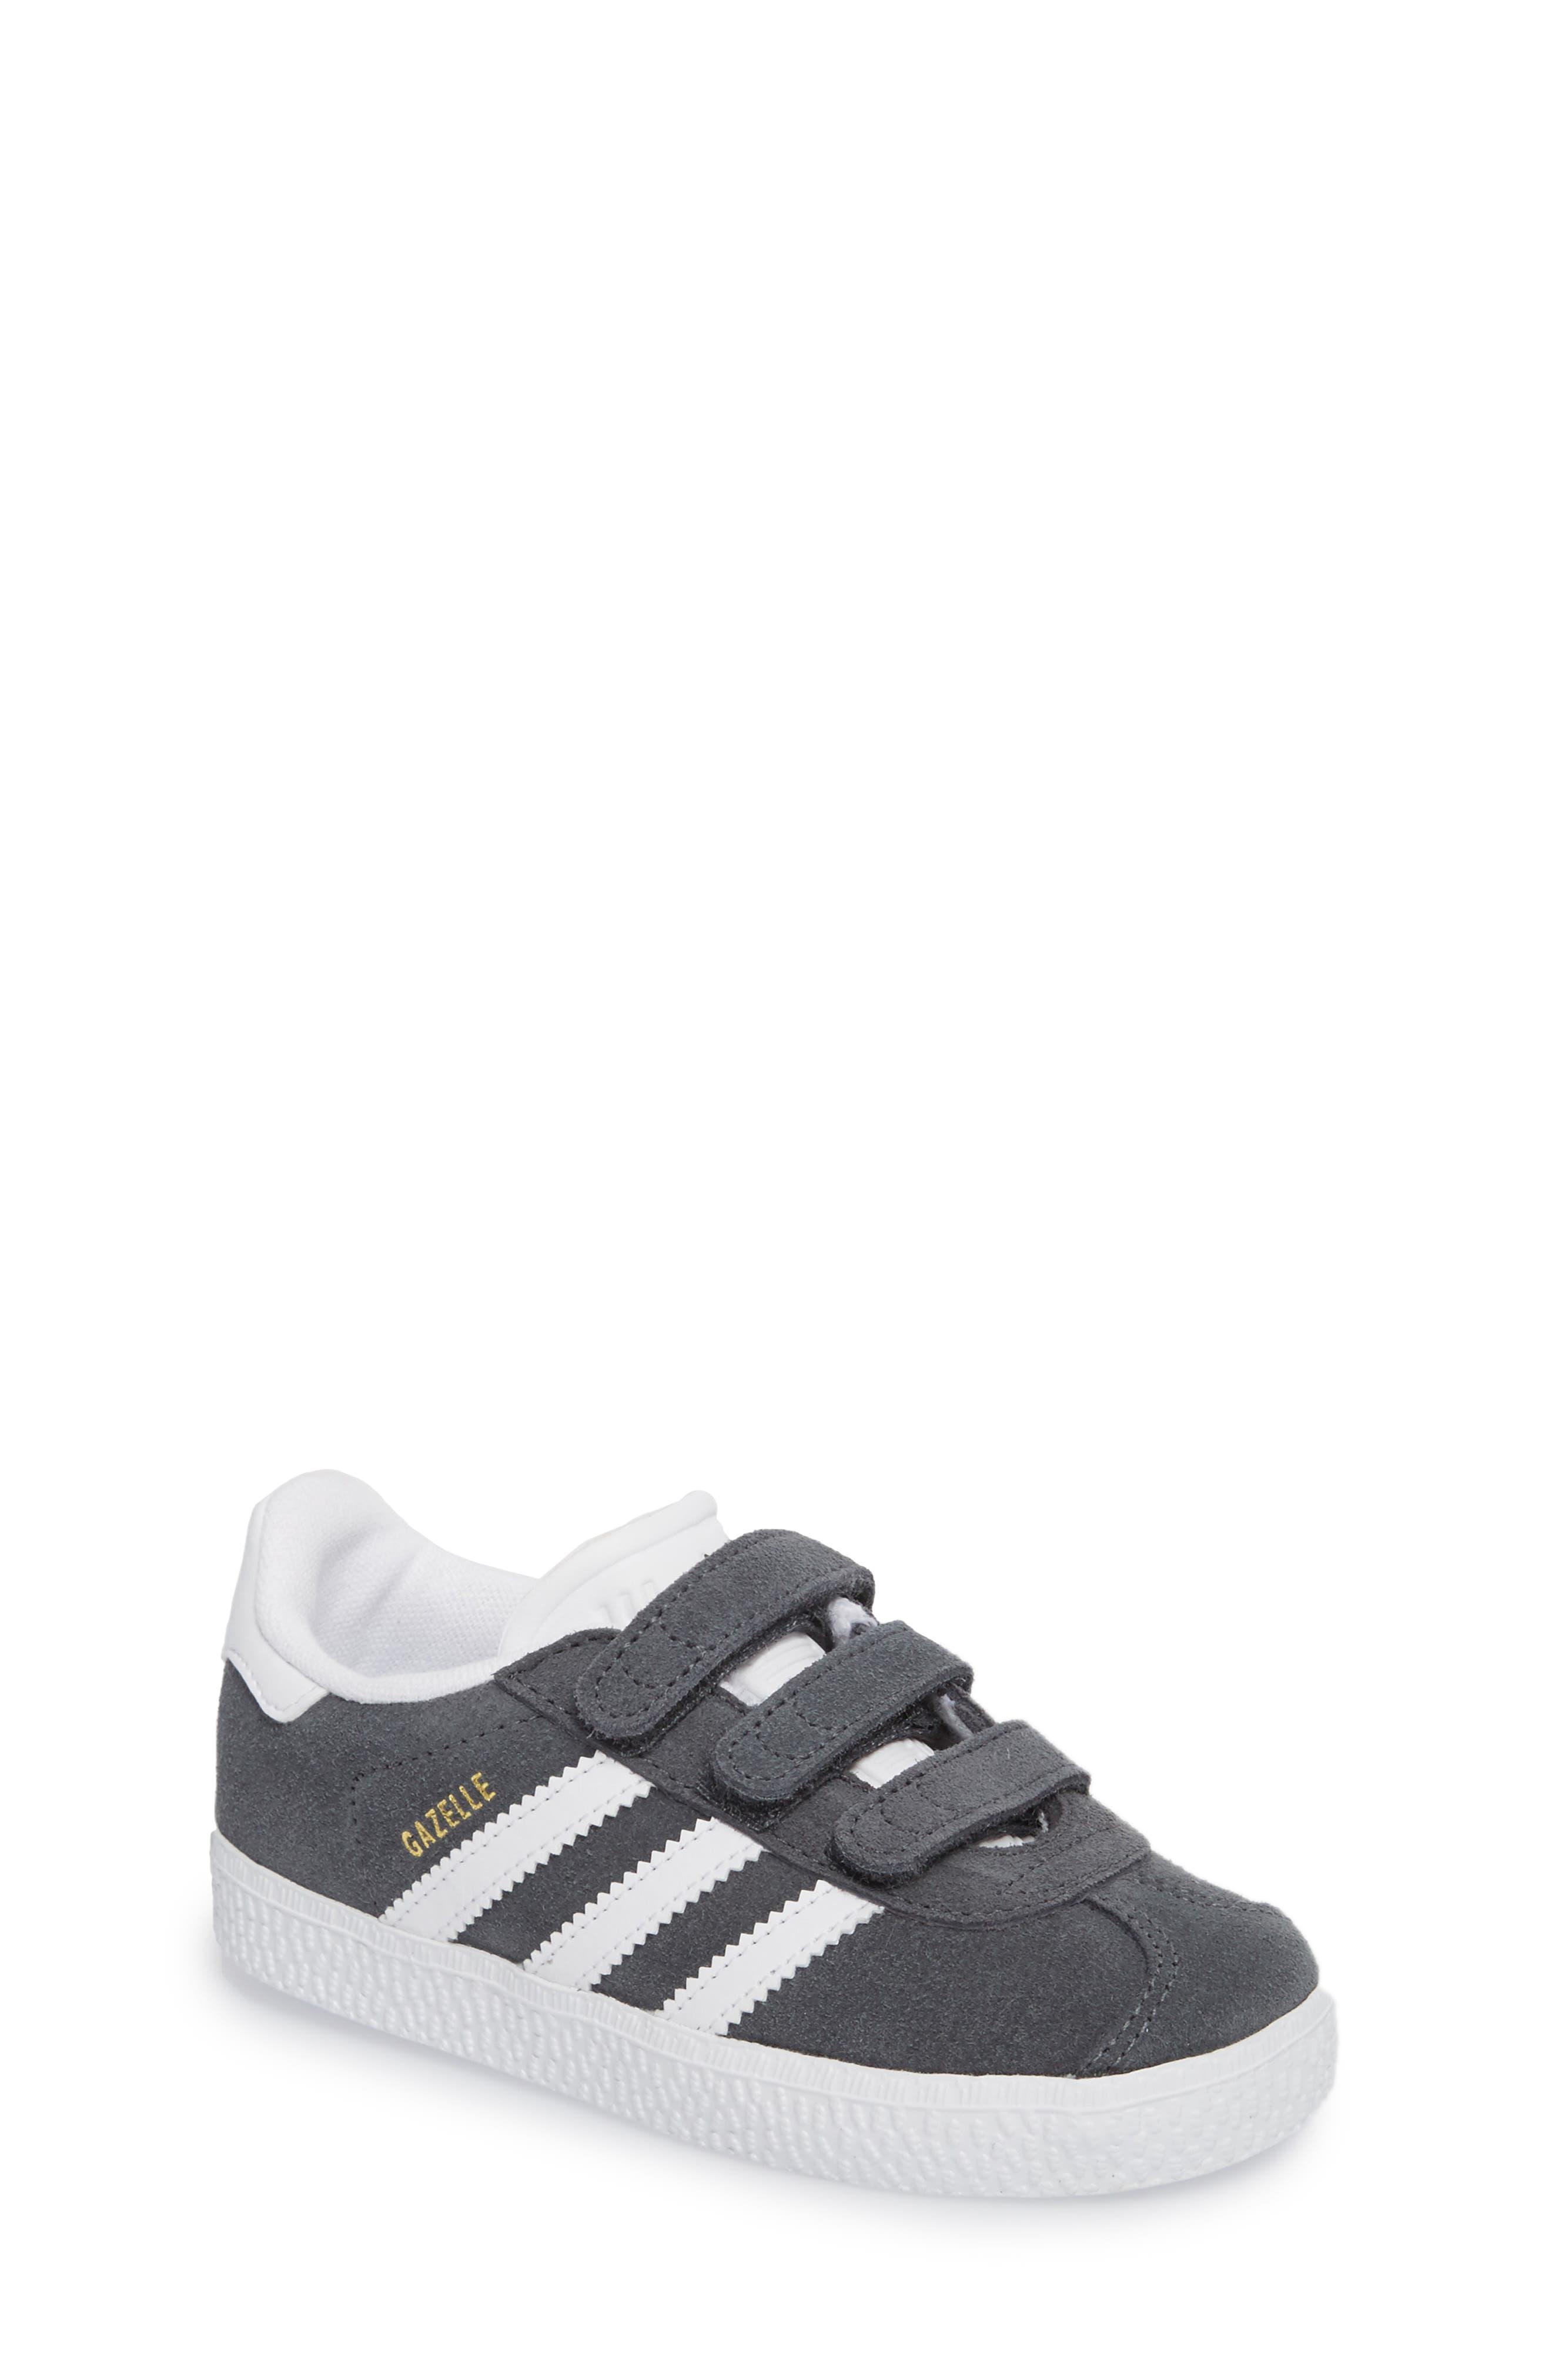 Gazelle Sneaker,                         Main,                         color, SOLID GREY / WHITE / WHITE